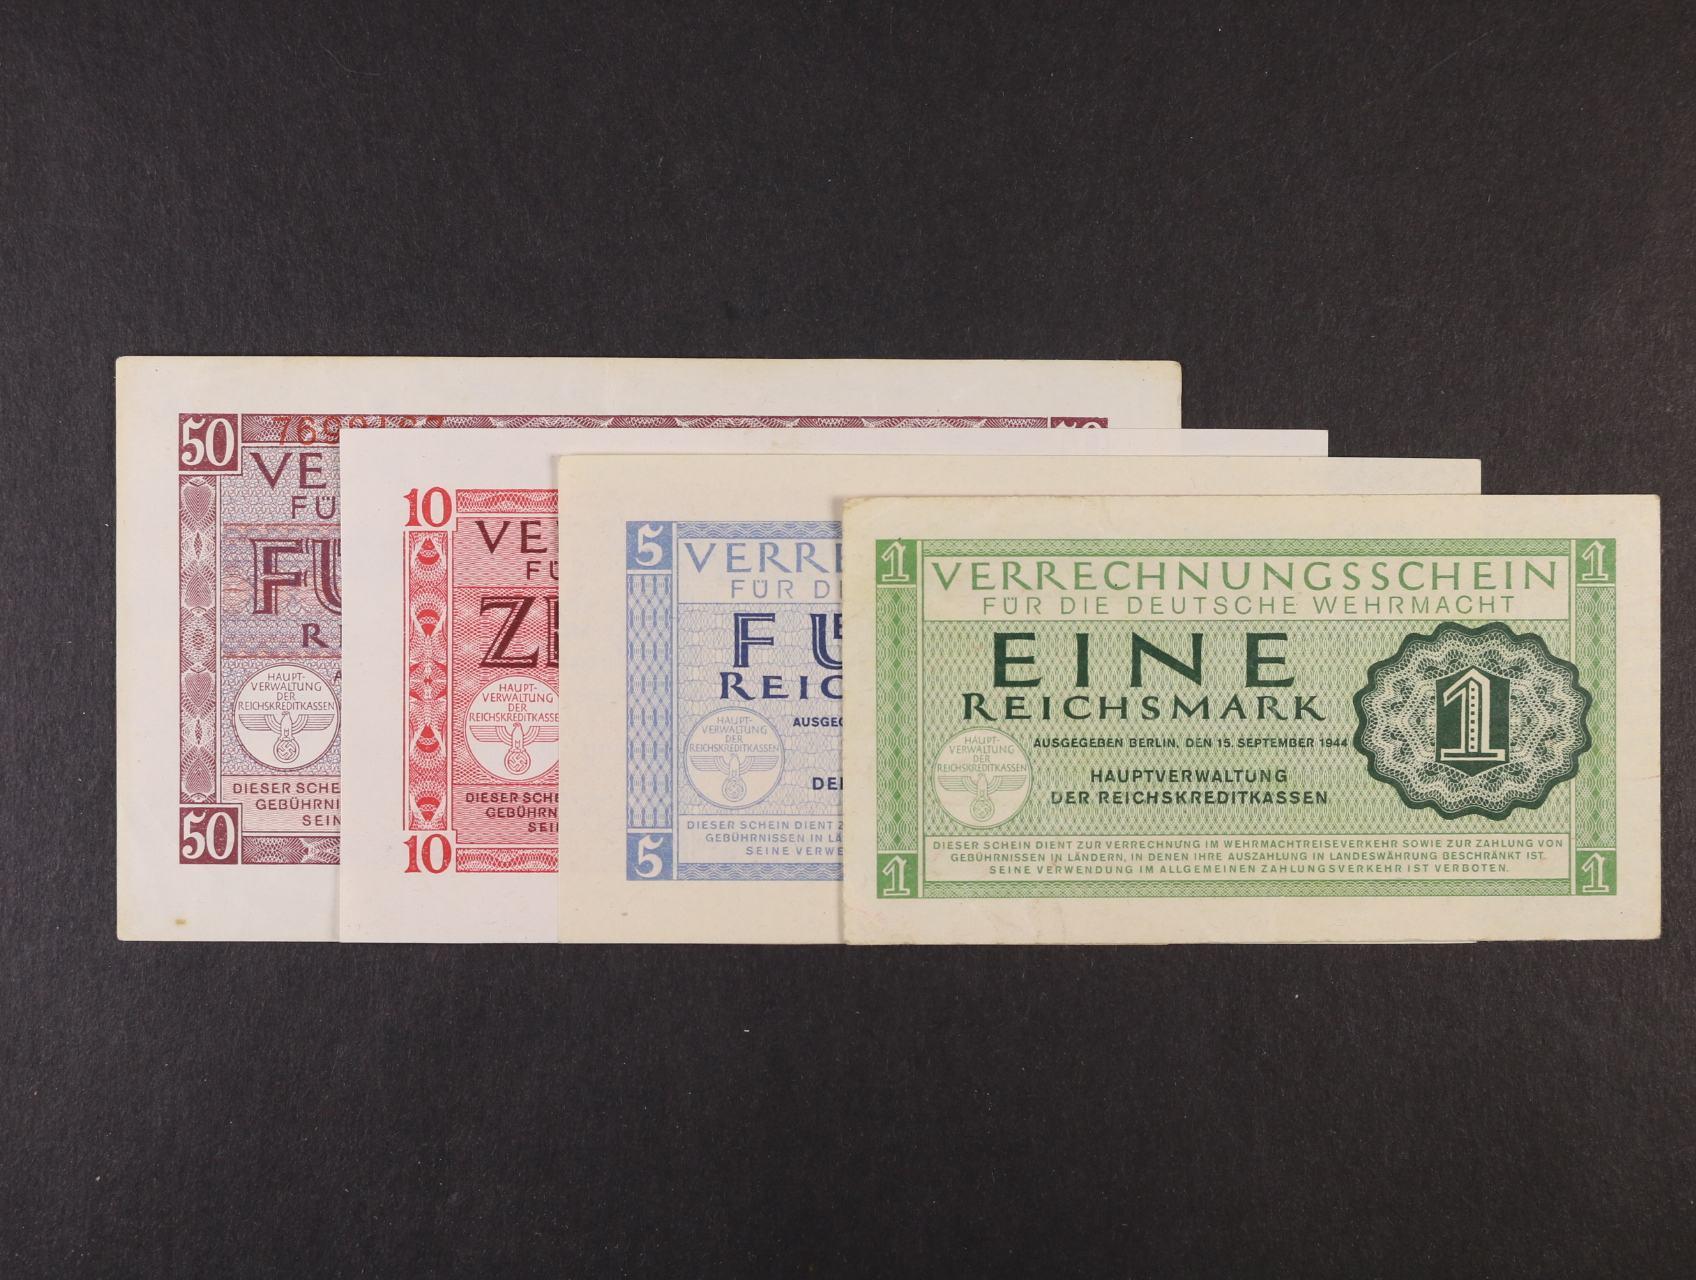 Vydání pro Wehrmacht 1944, sada 1, 5, 10, 50 RM 15.9.1944, Ro. 511 - 514